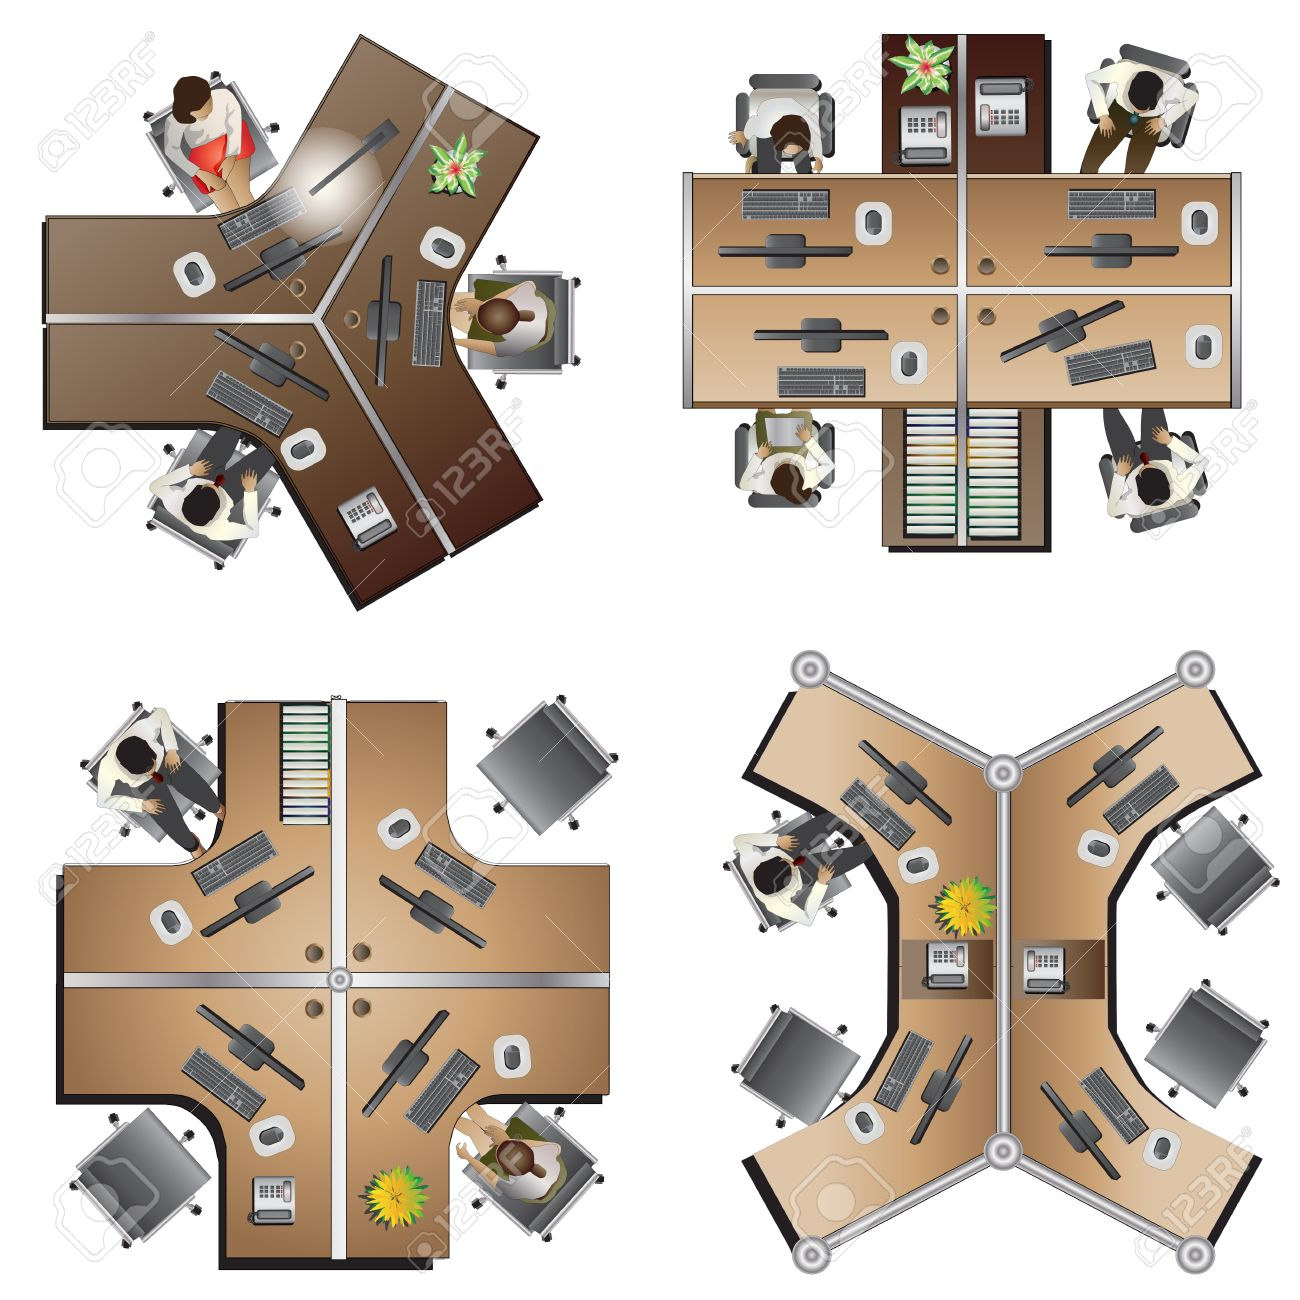 Office furniture top view - Office Furniture Top View Set 8 For Interior Vector Illustration Stock Vector 45840738